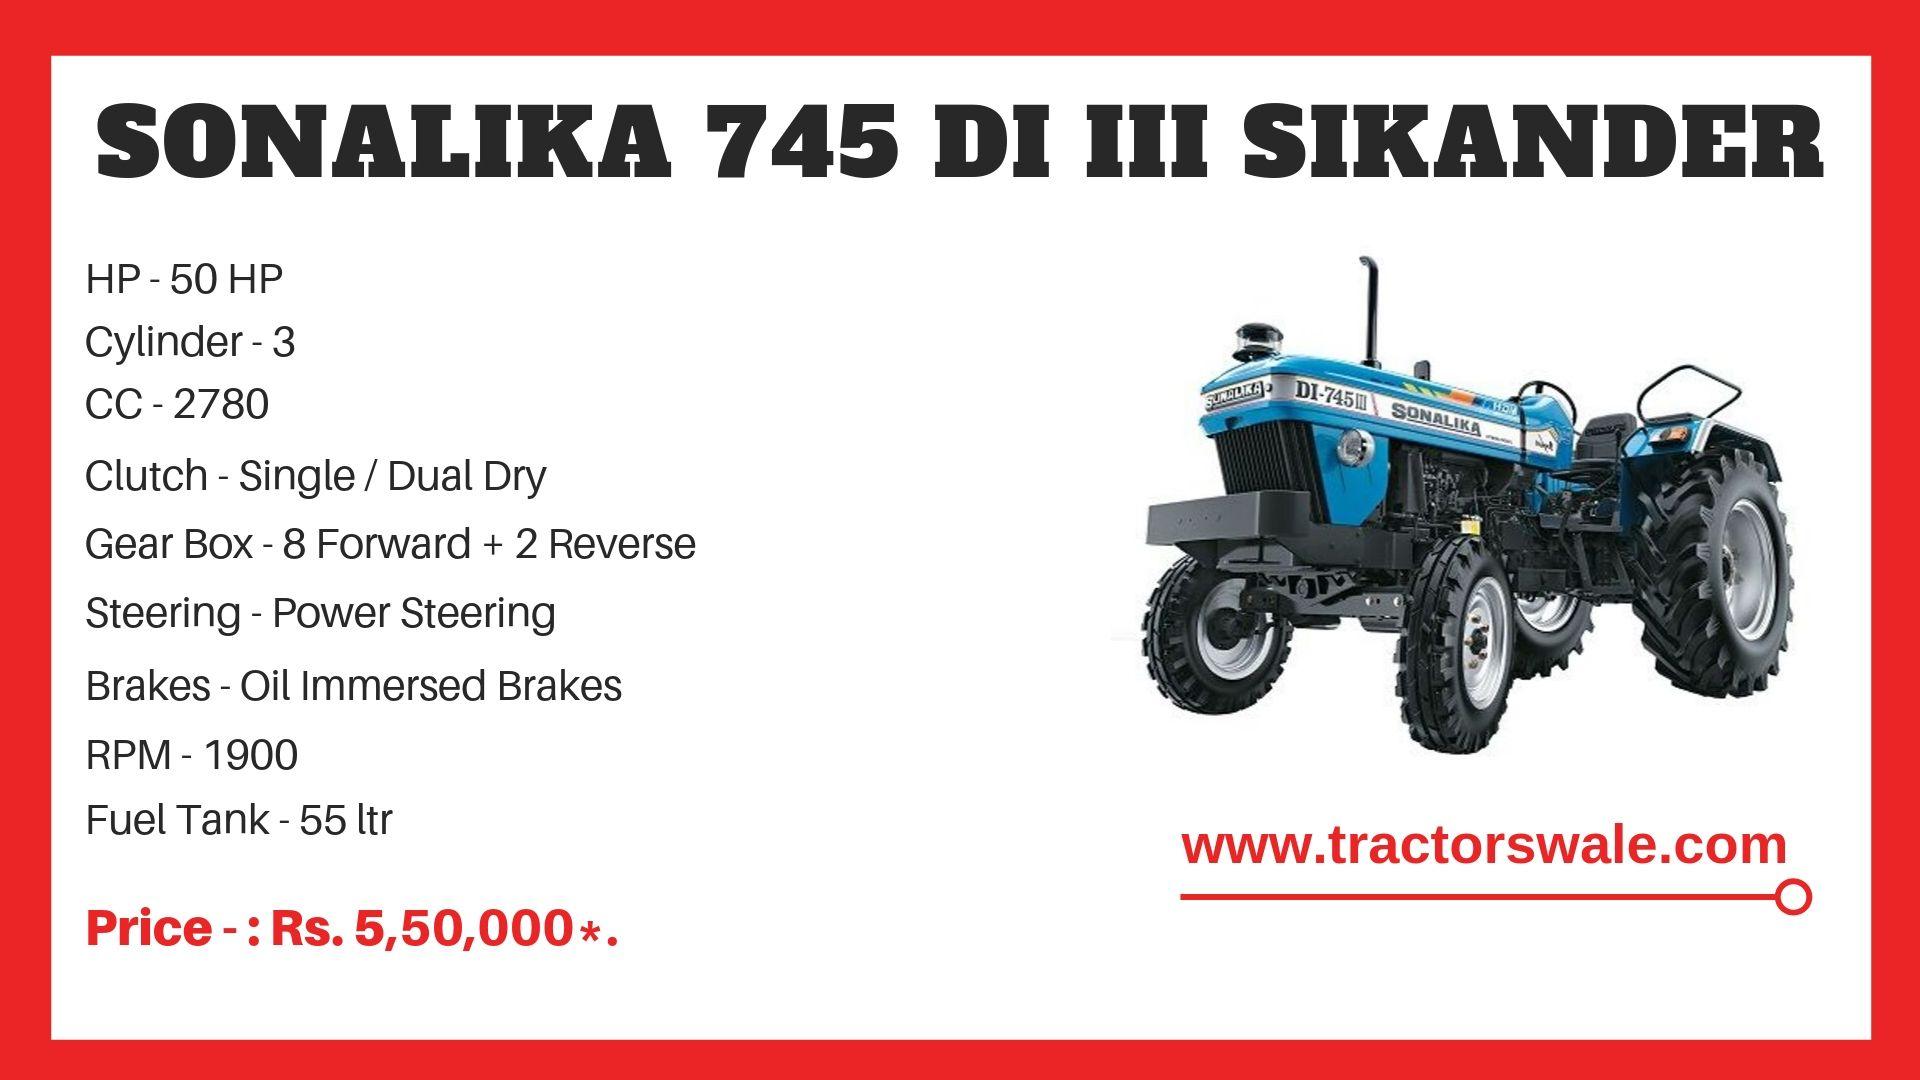 Sonalika 745 DI III SIKANDER Tractor specs